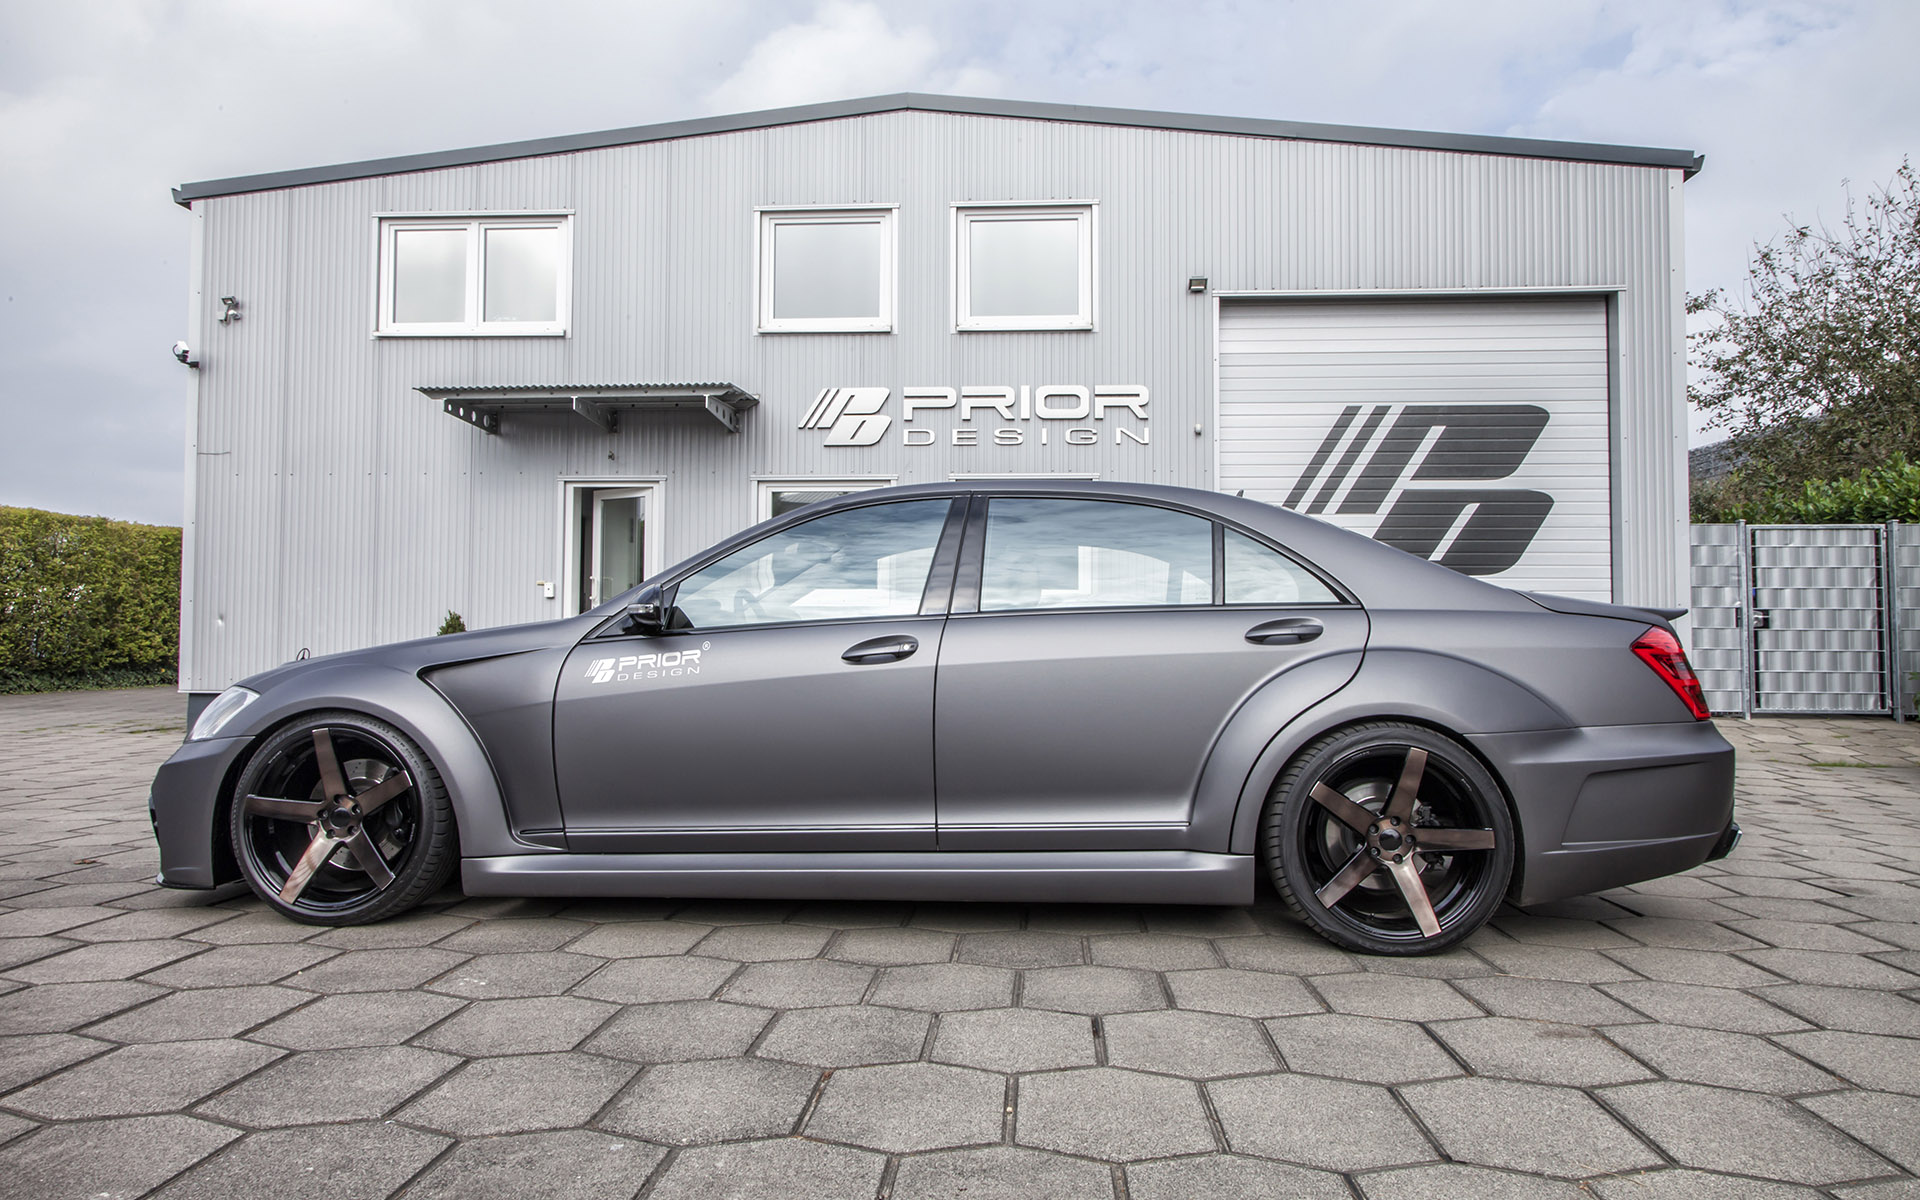 PRIOR-DESIGN Black Edition V3 Widebody Aero-Kit for ...